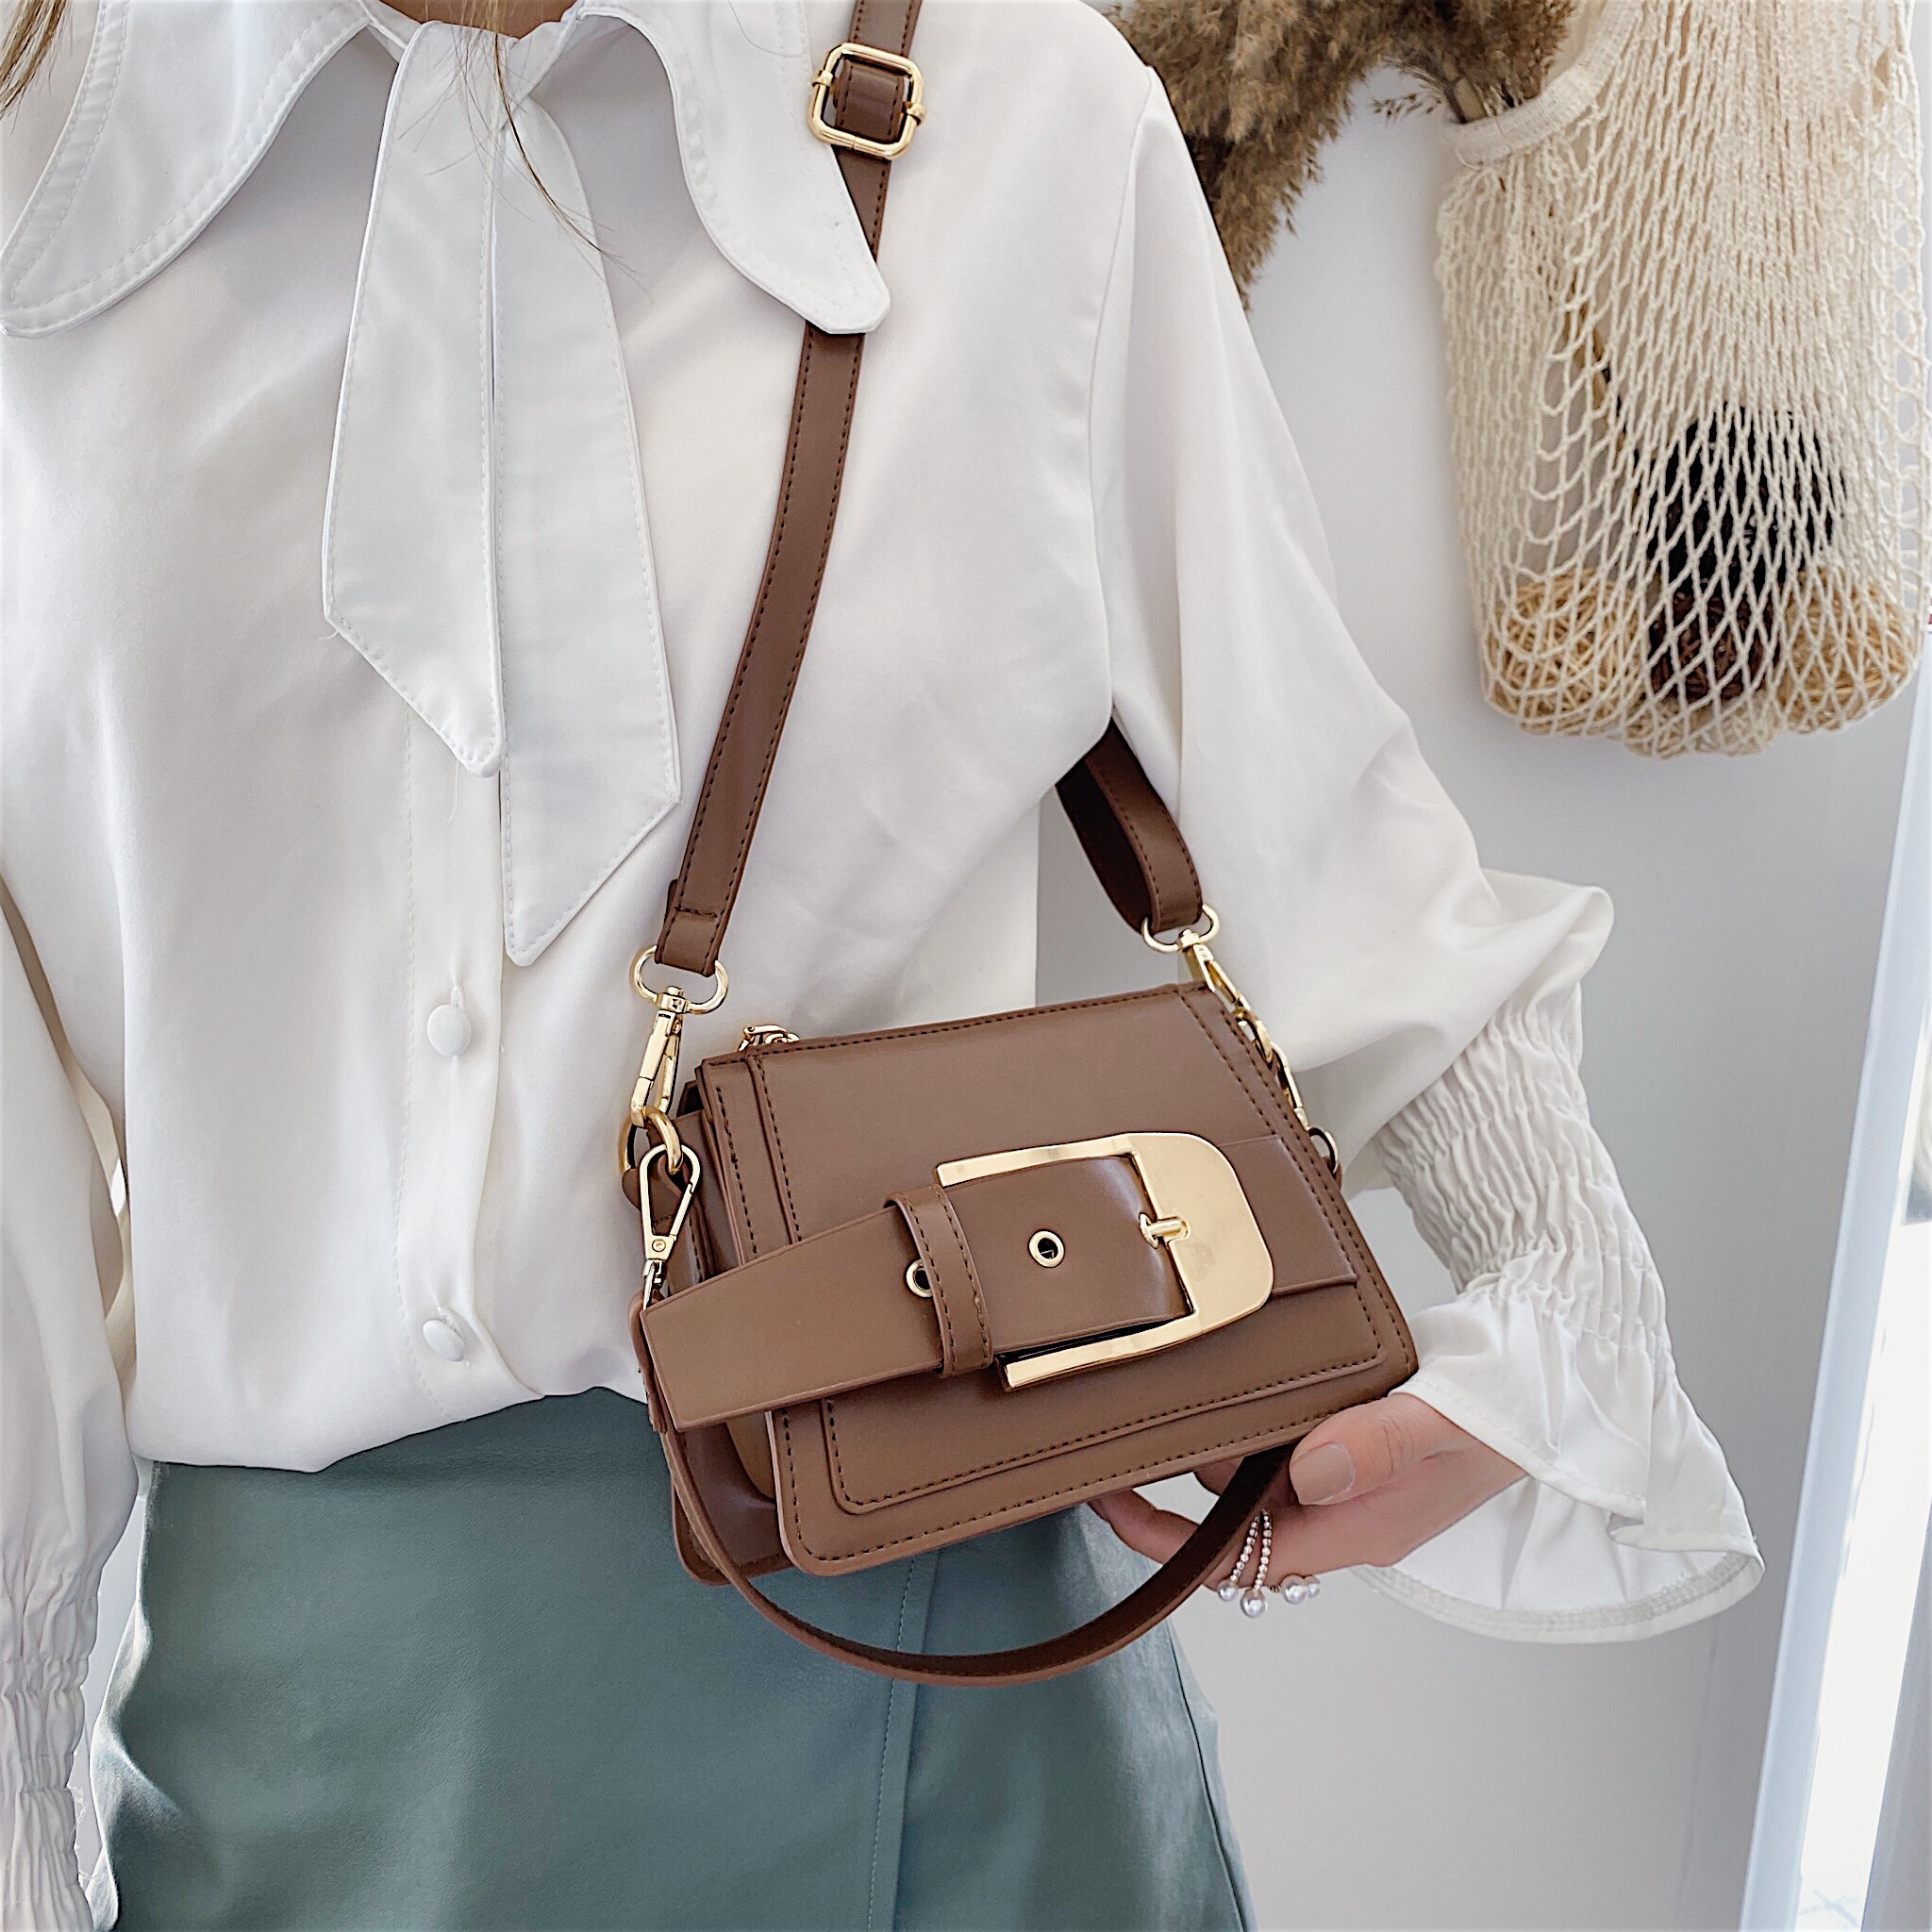 Belt Buckle Pu Leather Crossbody Bags For Women 2020 MINI Travel Shoulder Messenger Handbags Female Travel Cross Body Bag